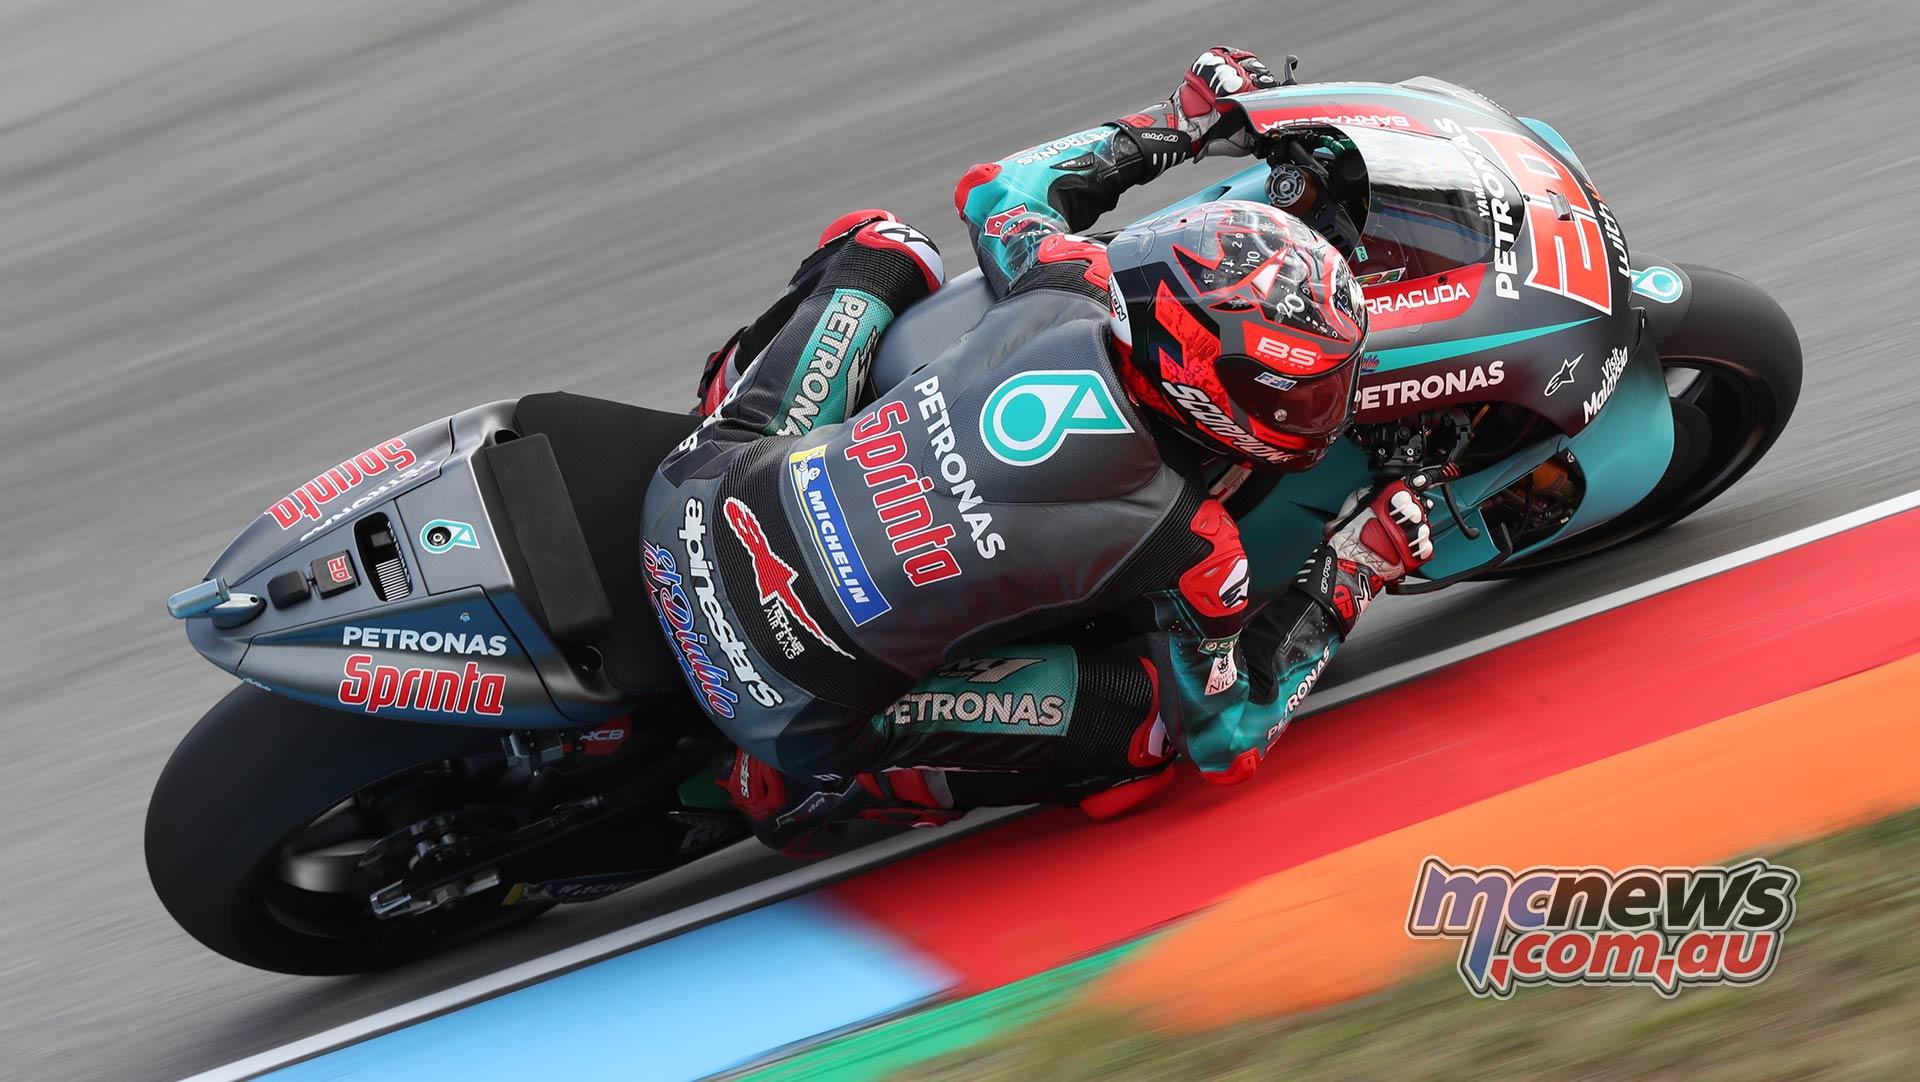 MotoGP Round Brno Fri Quartararo